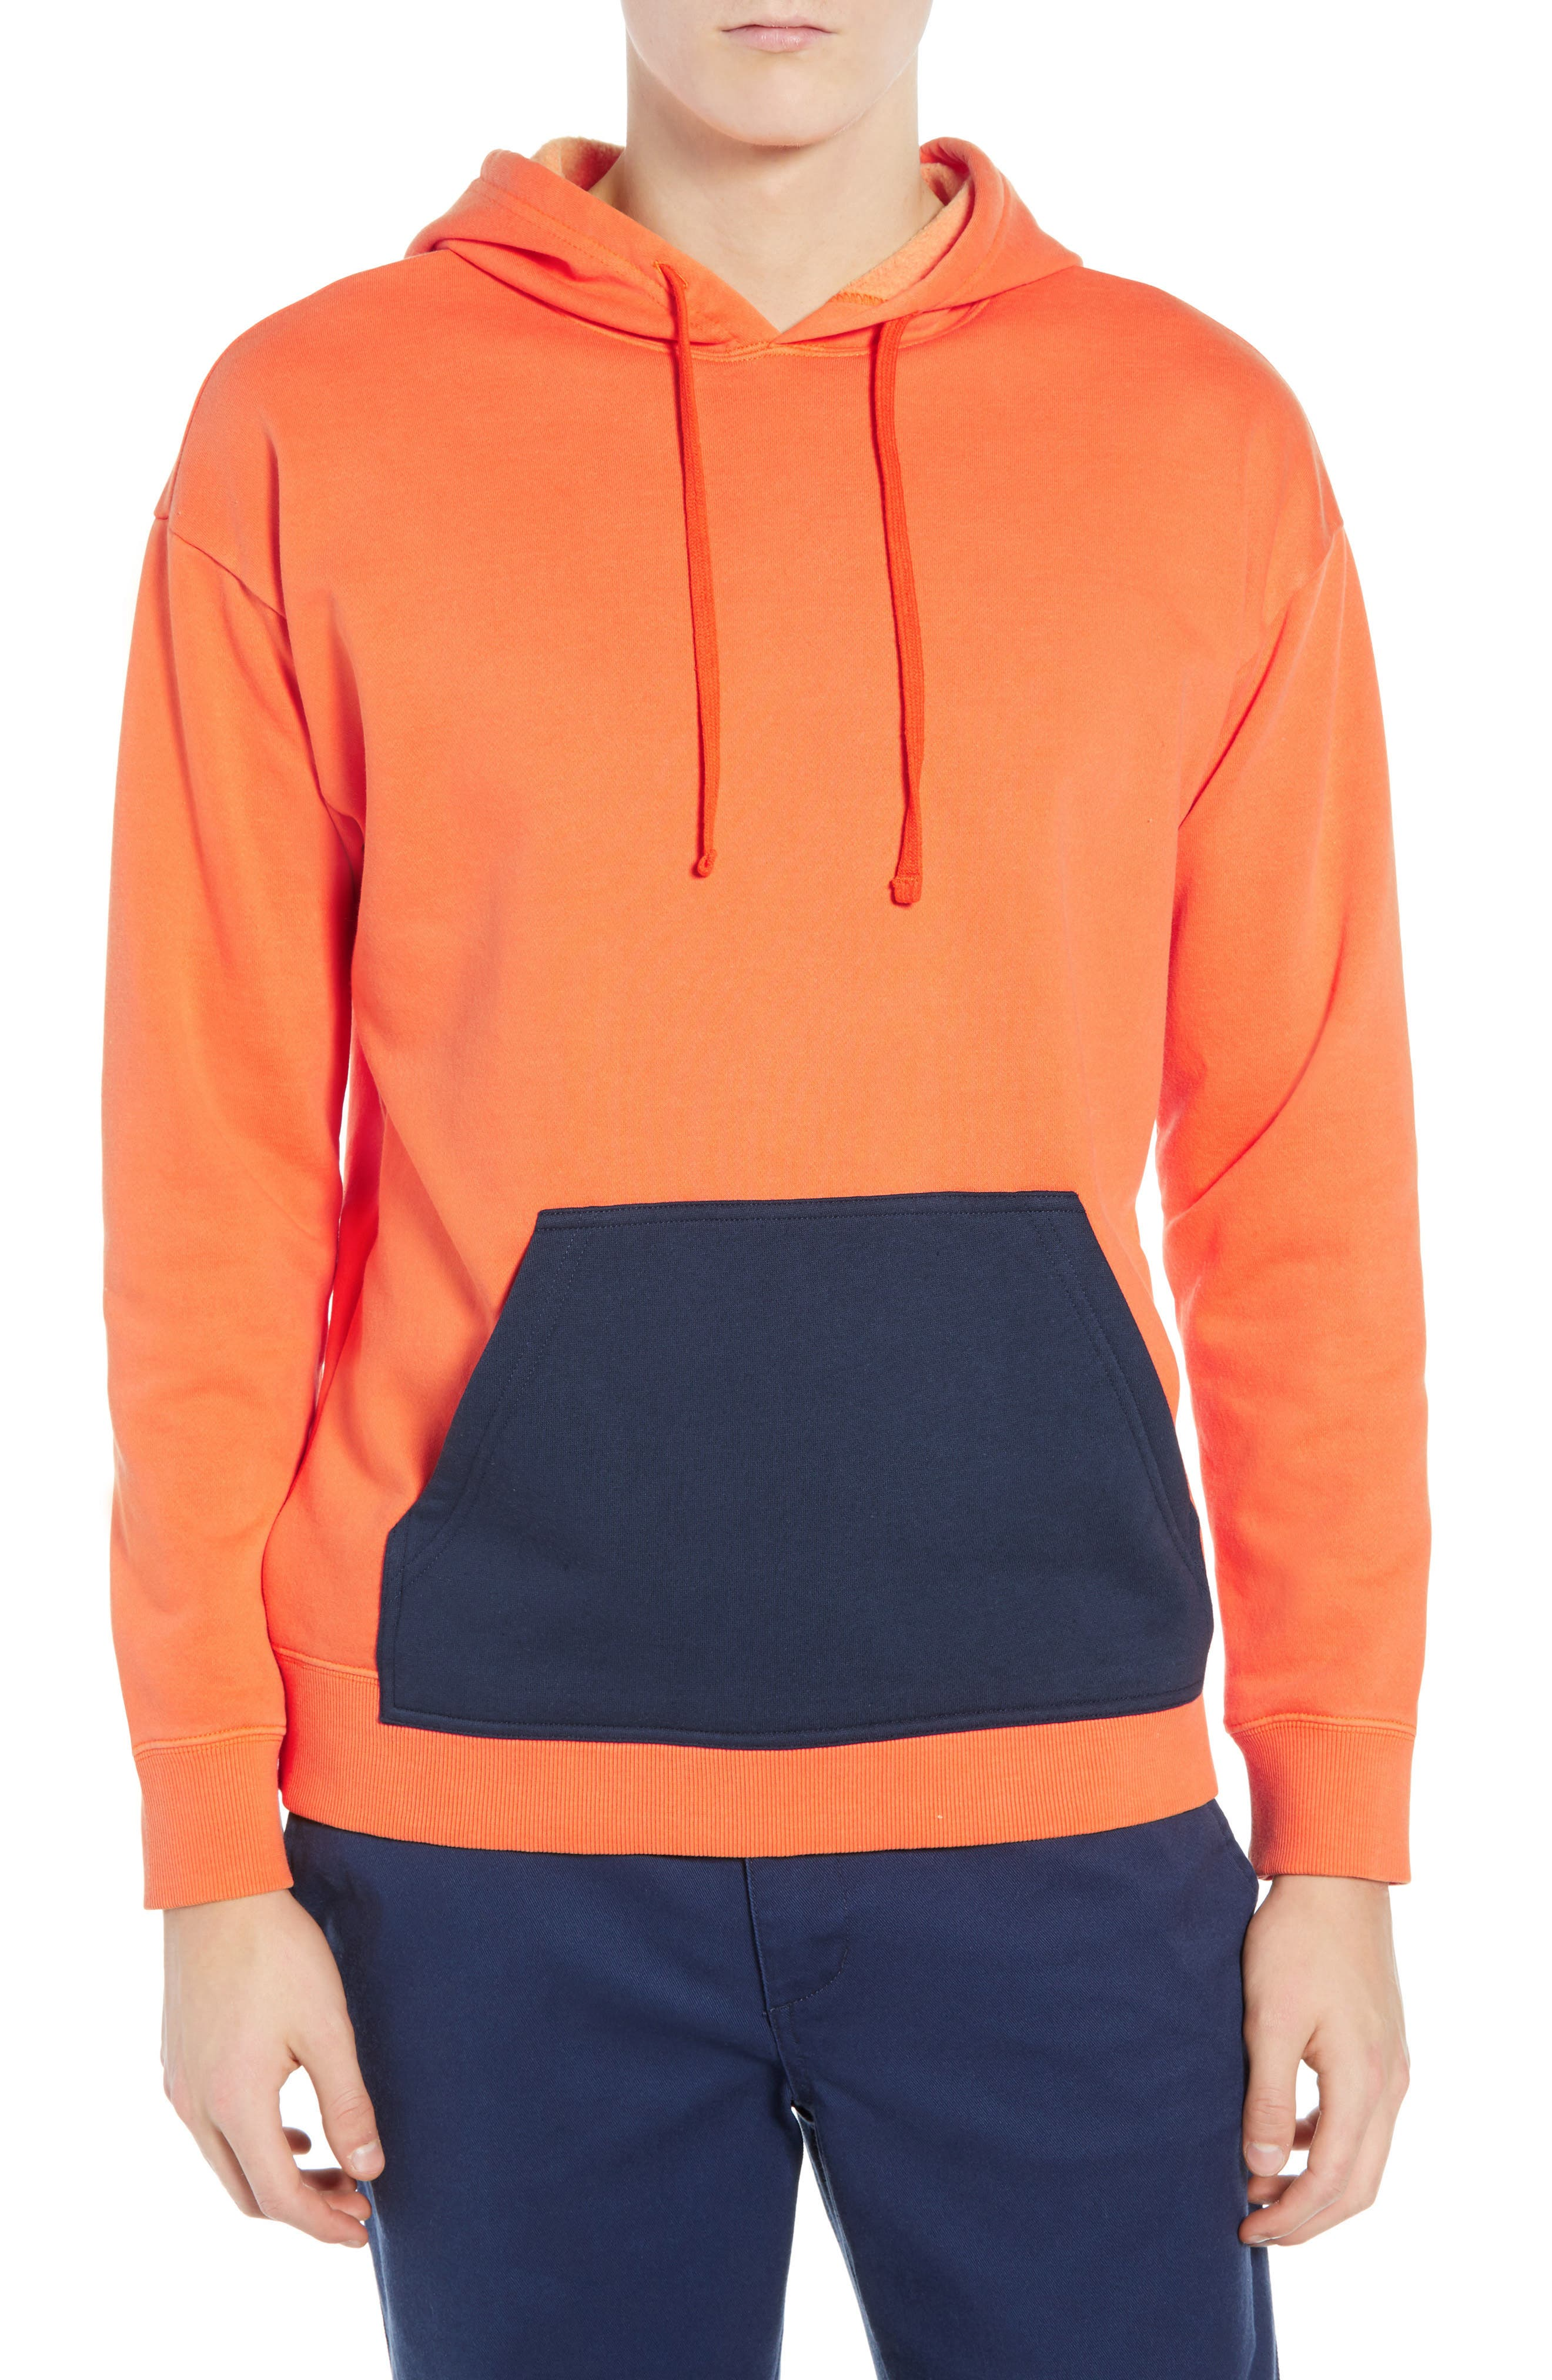 Rvca Adrian Colorblock Hoodie, Orange